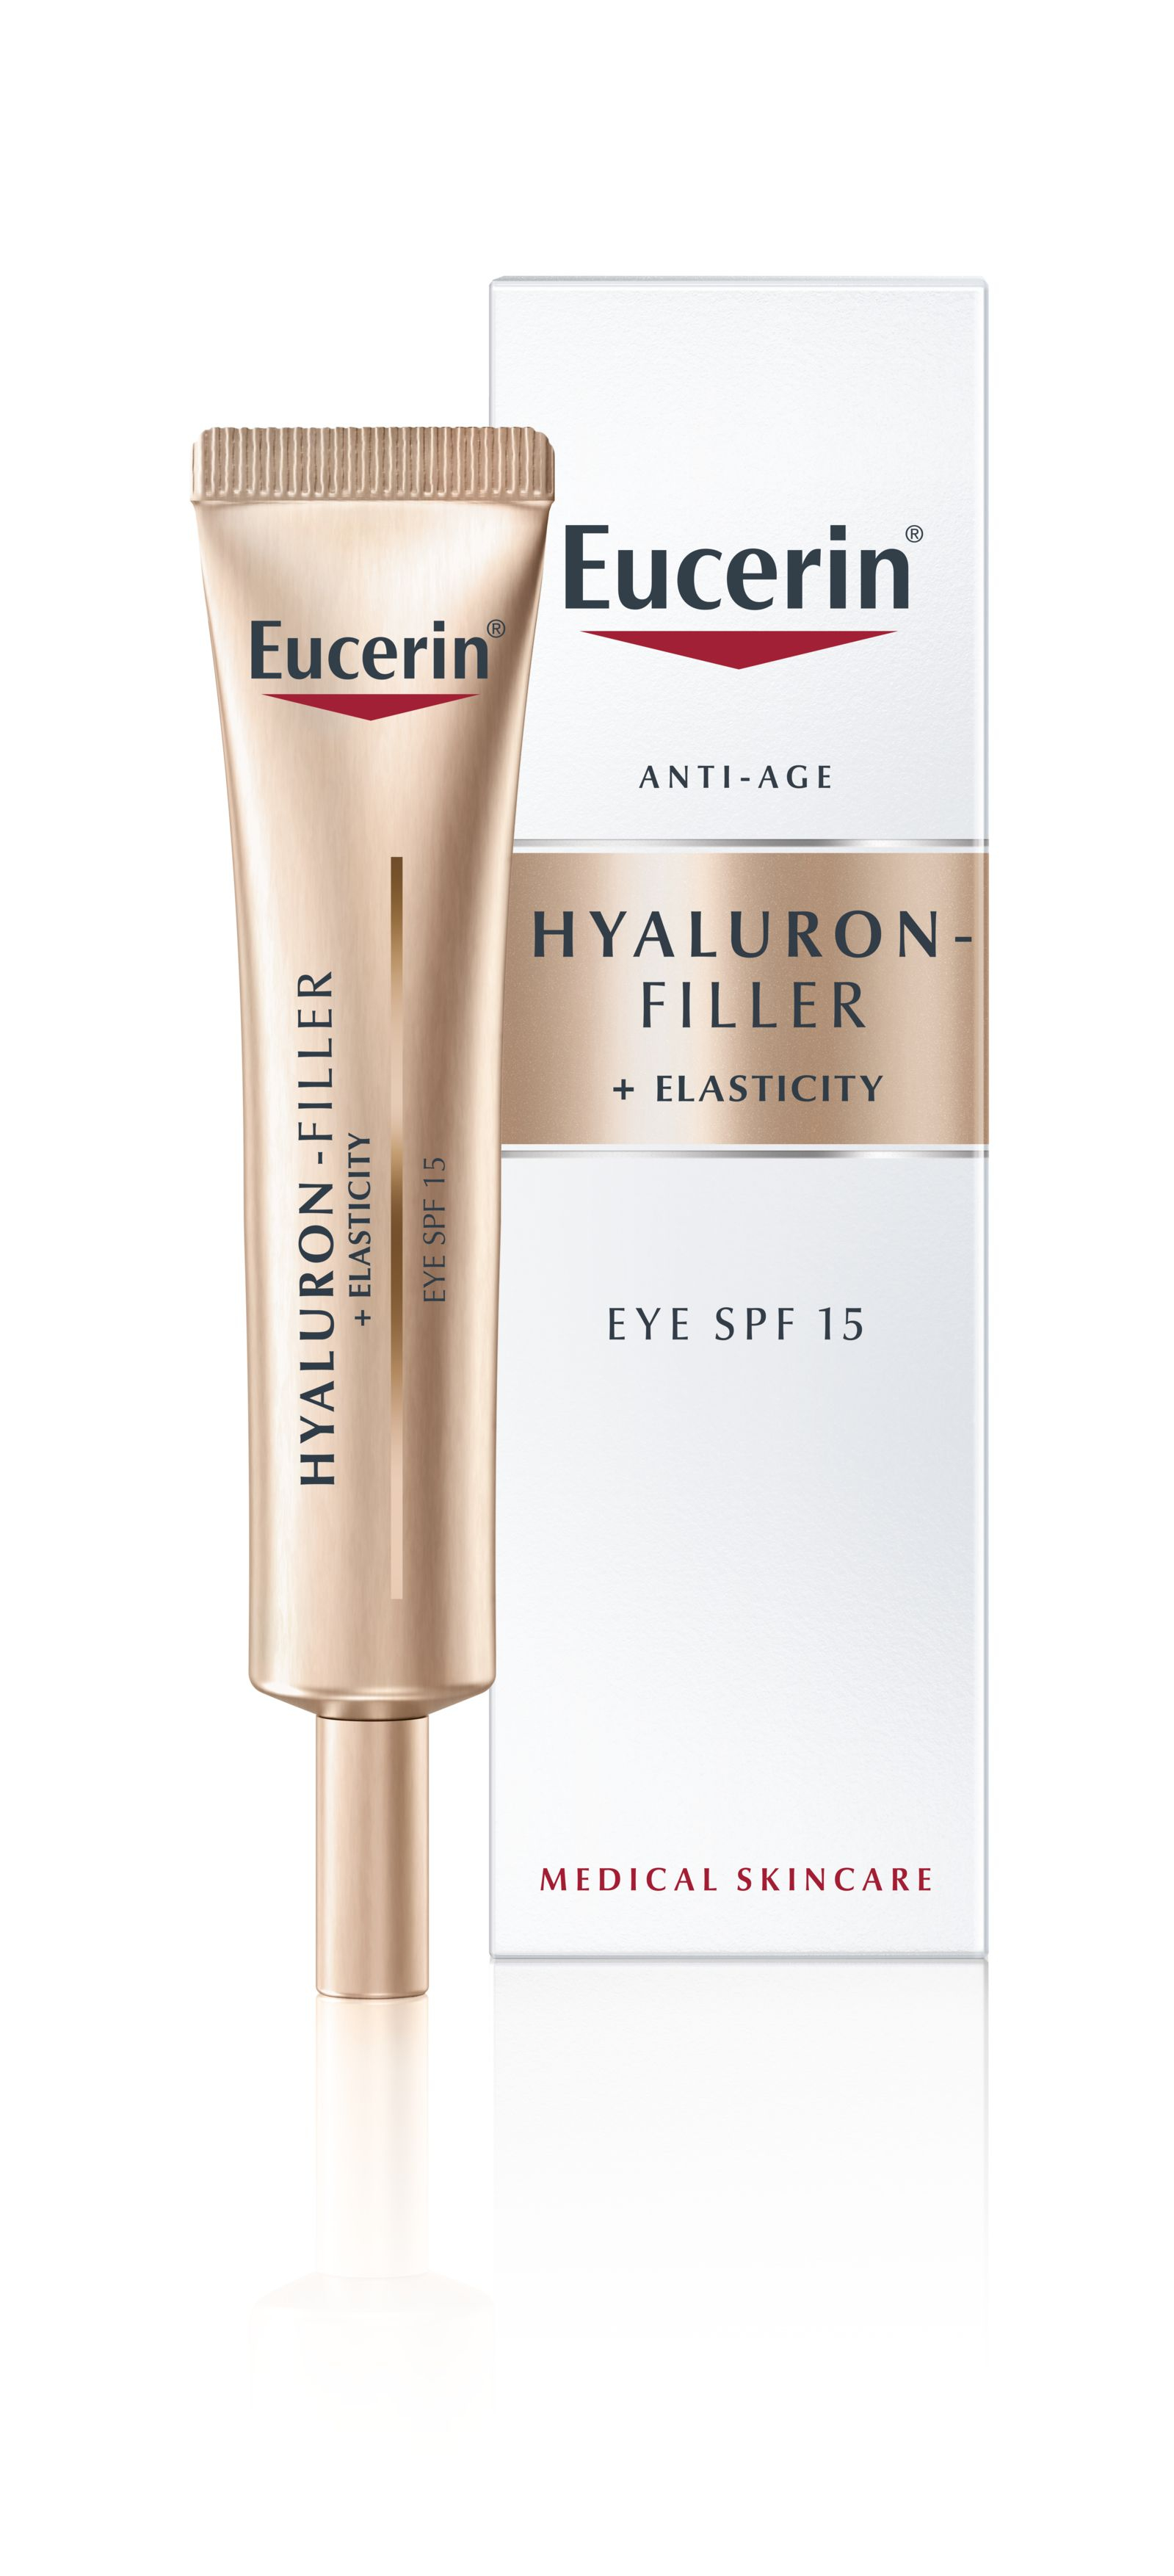 Eucerin Hyaluron-Filler + Elasticity oční krém 15 ml